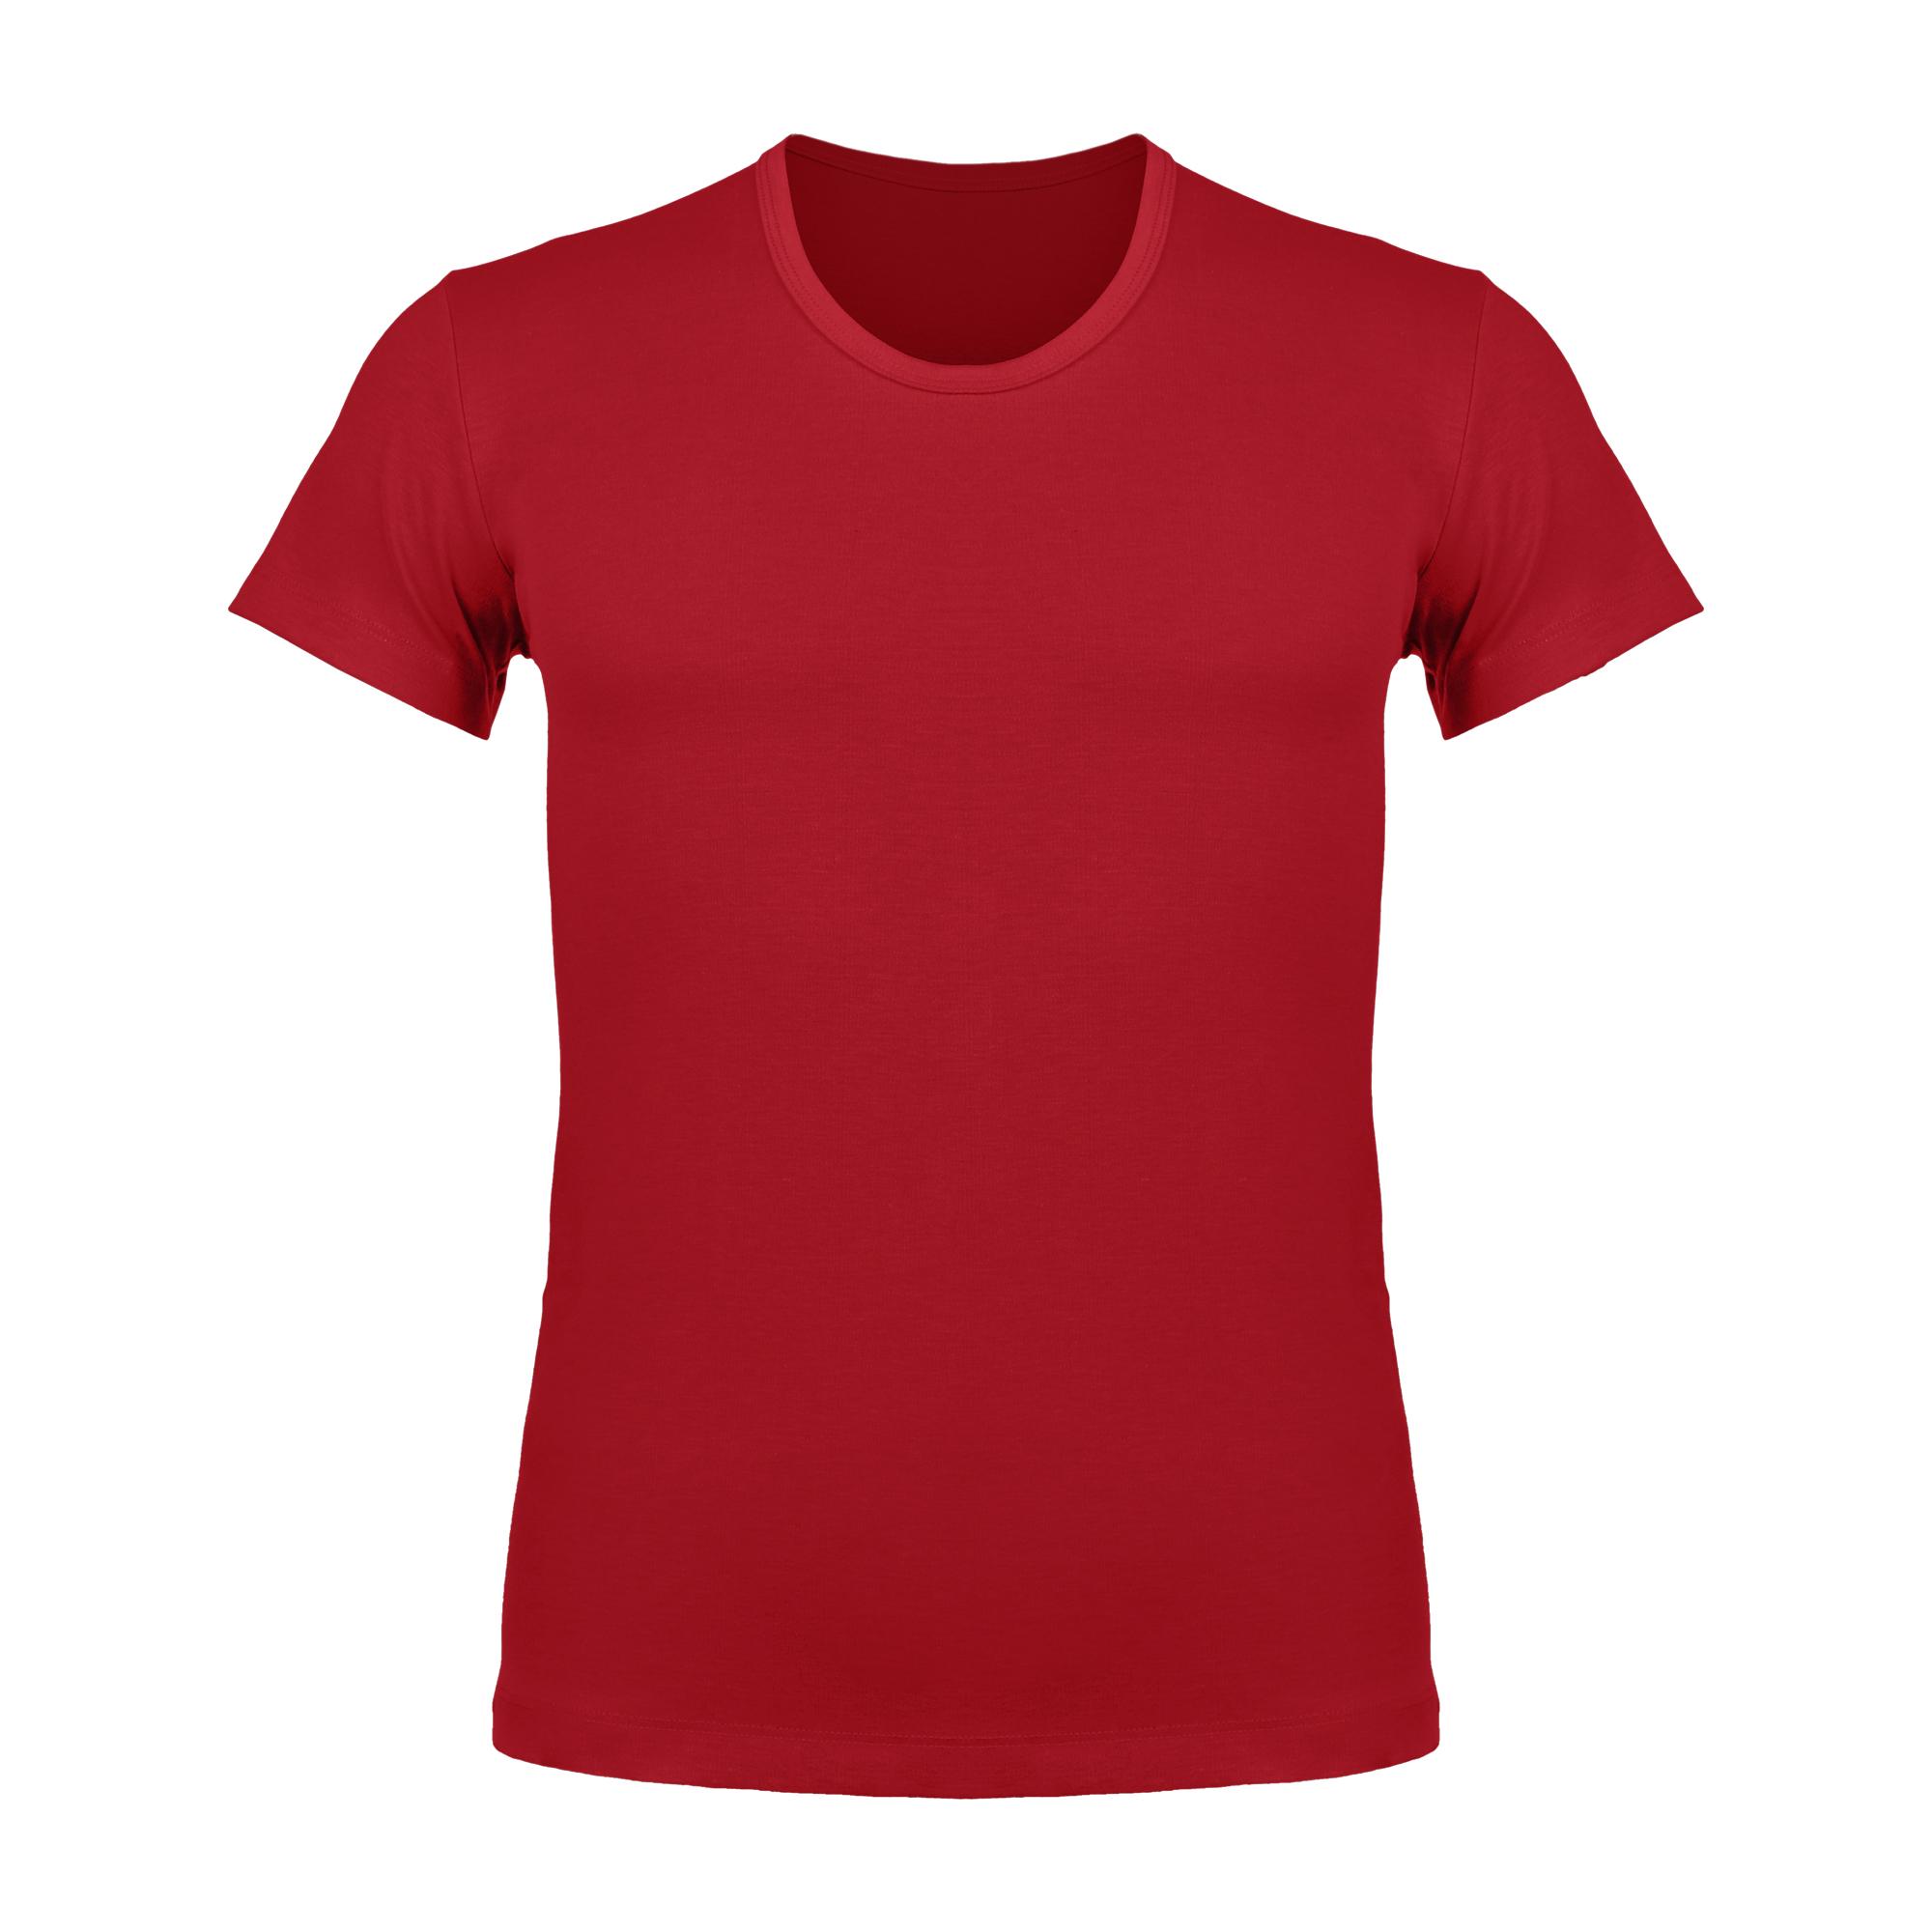 زیرپوش مردانه کیان تن پوش مدل U Neck Shirt Classic R